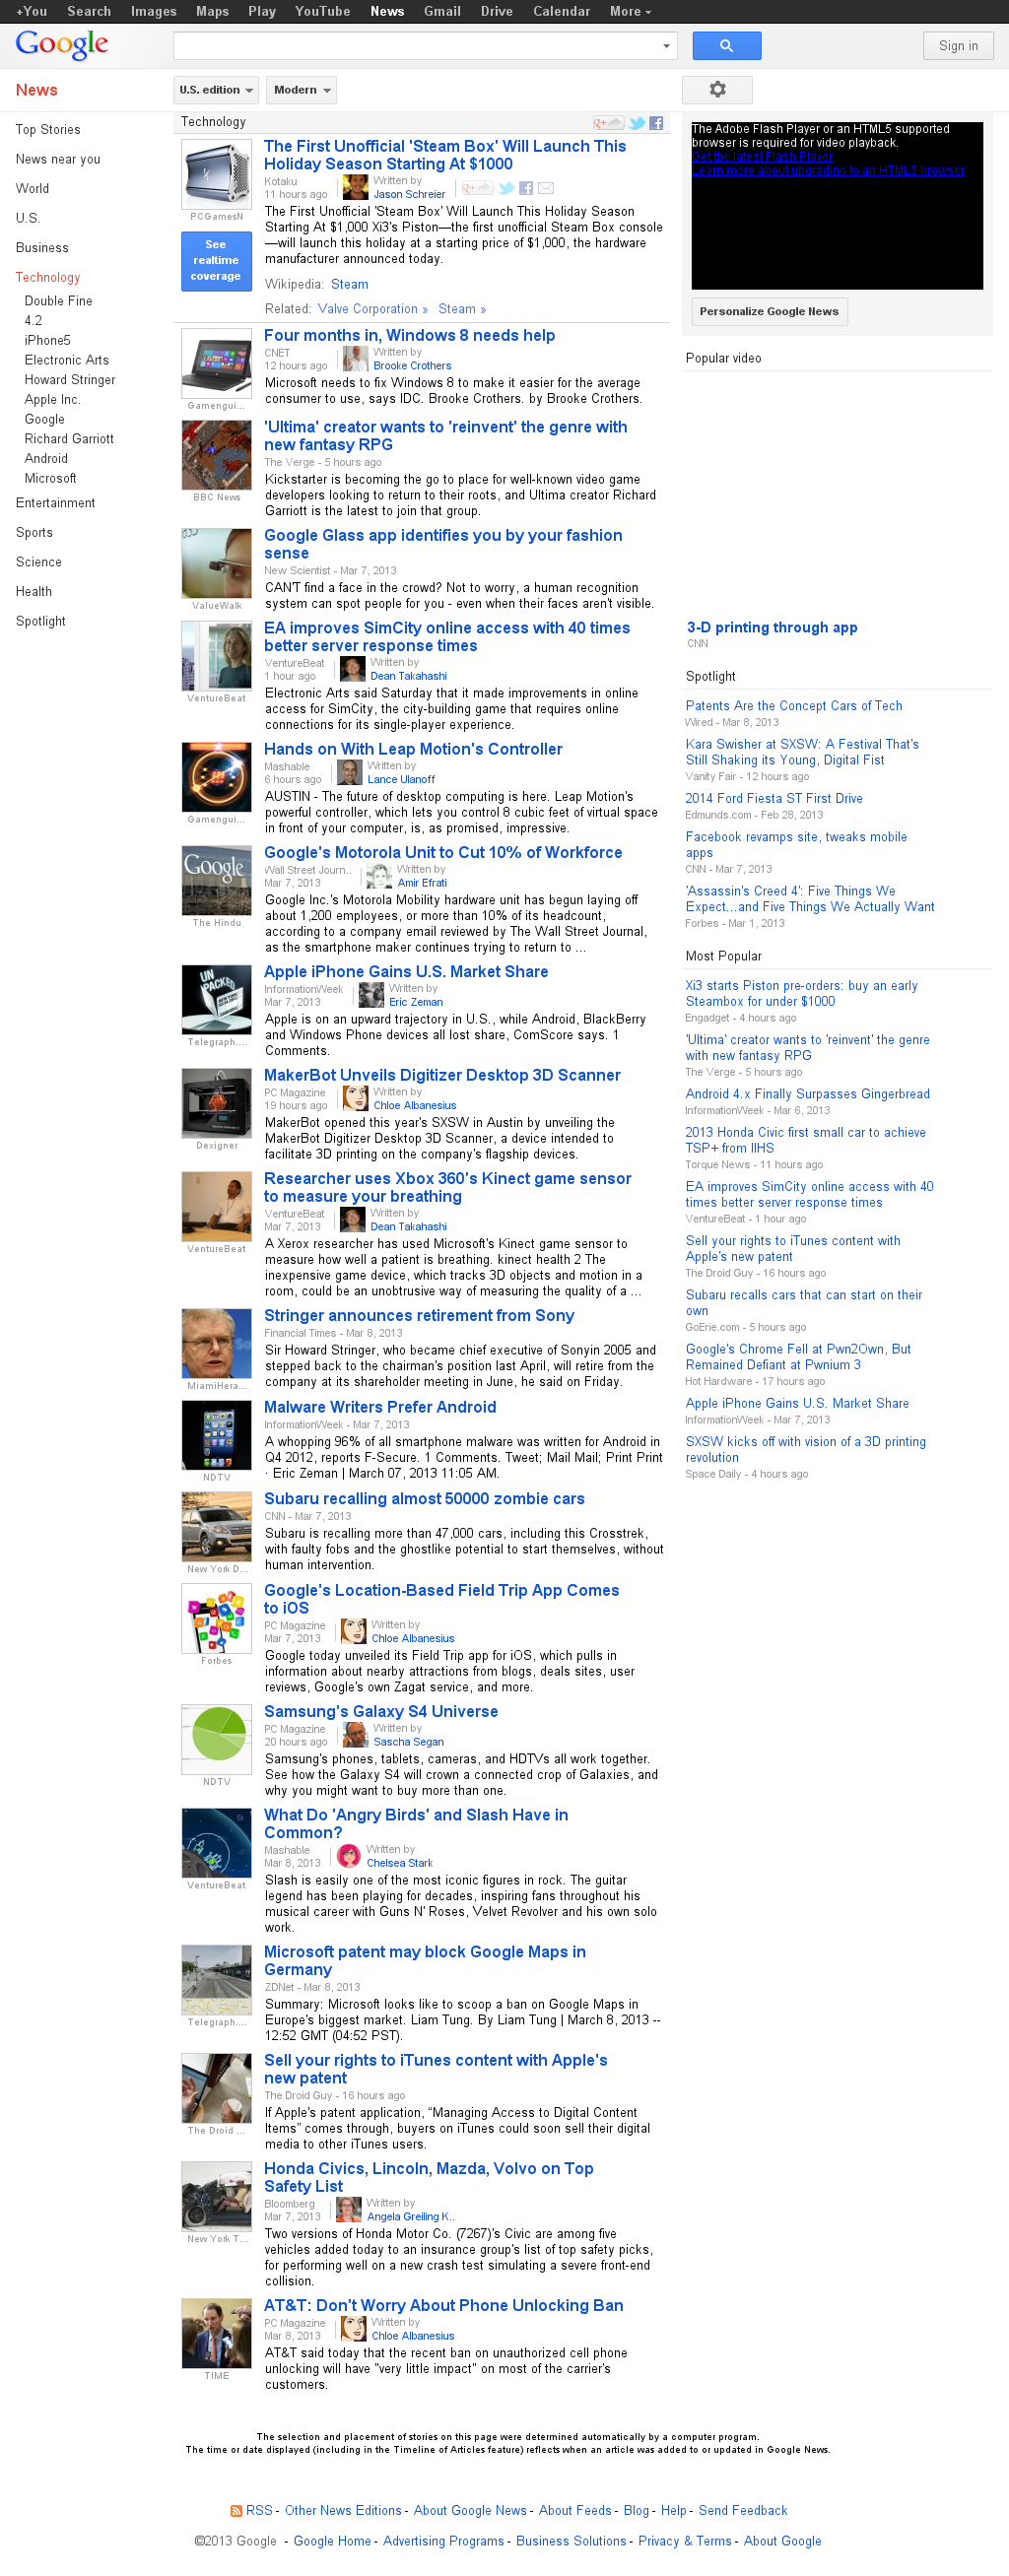 Google News: Technology at Sunday March 10, 2013, 11:07 a.m. UTC